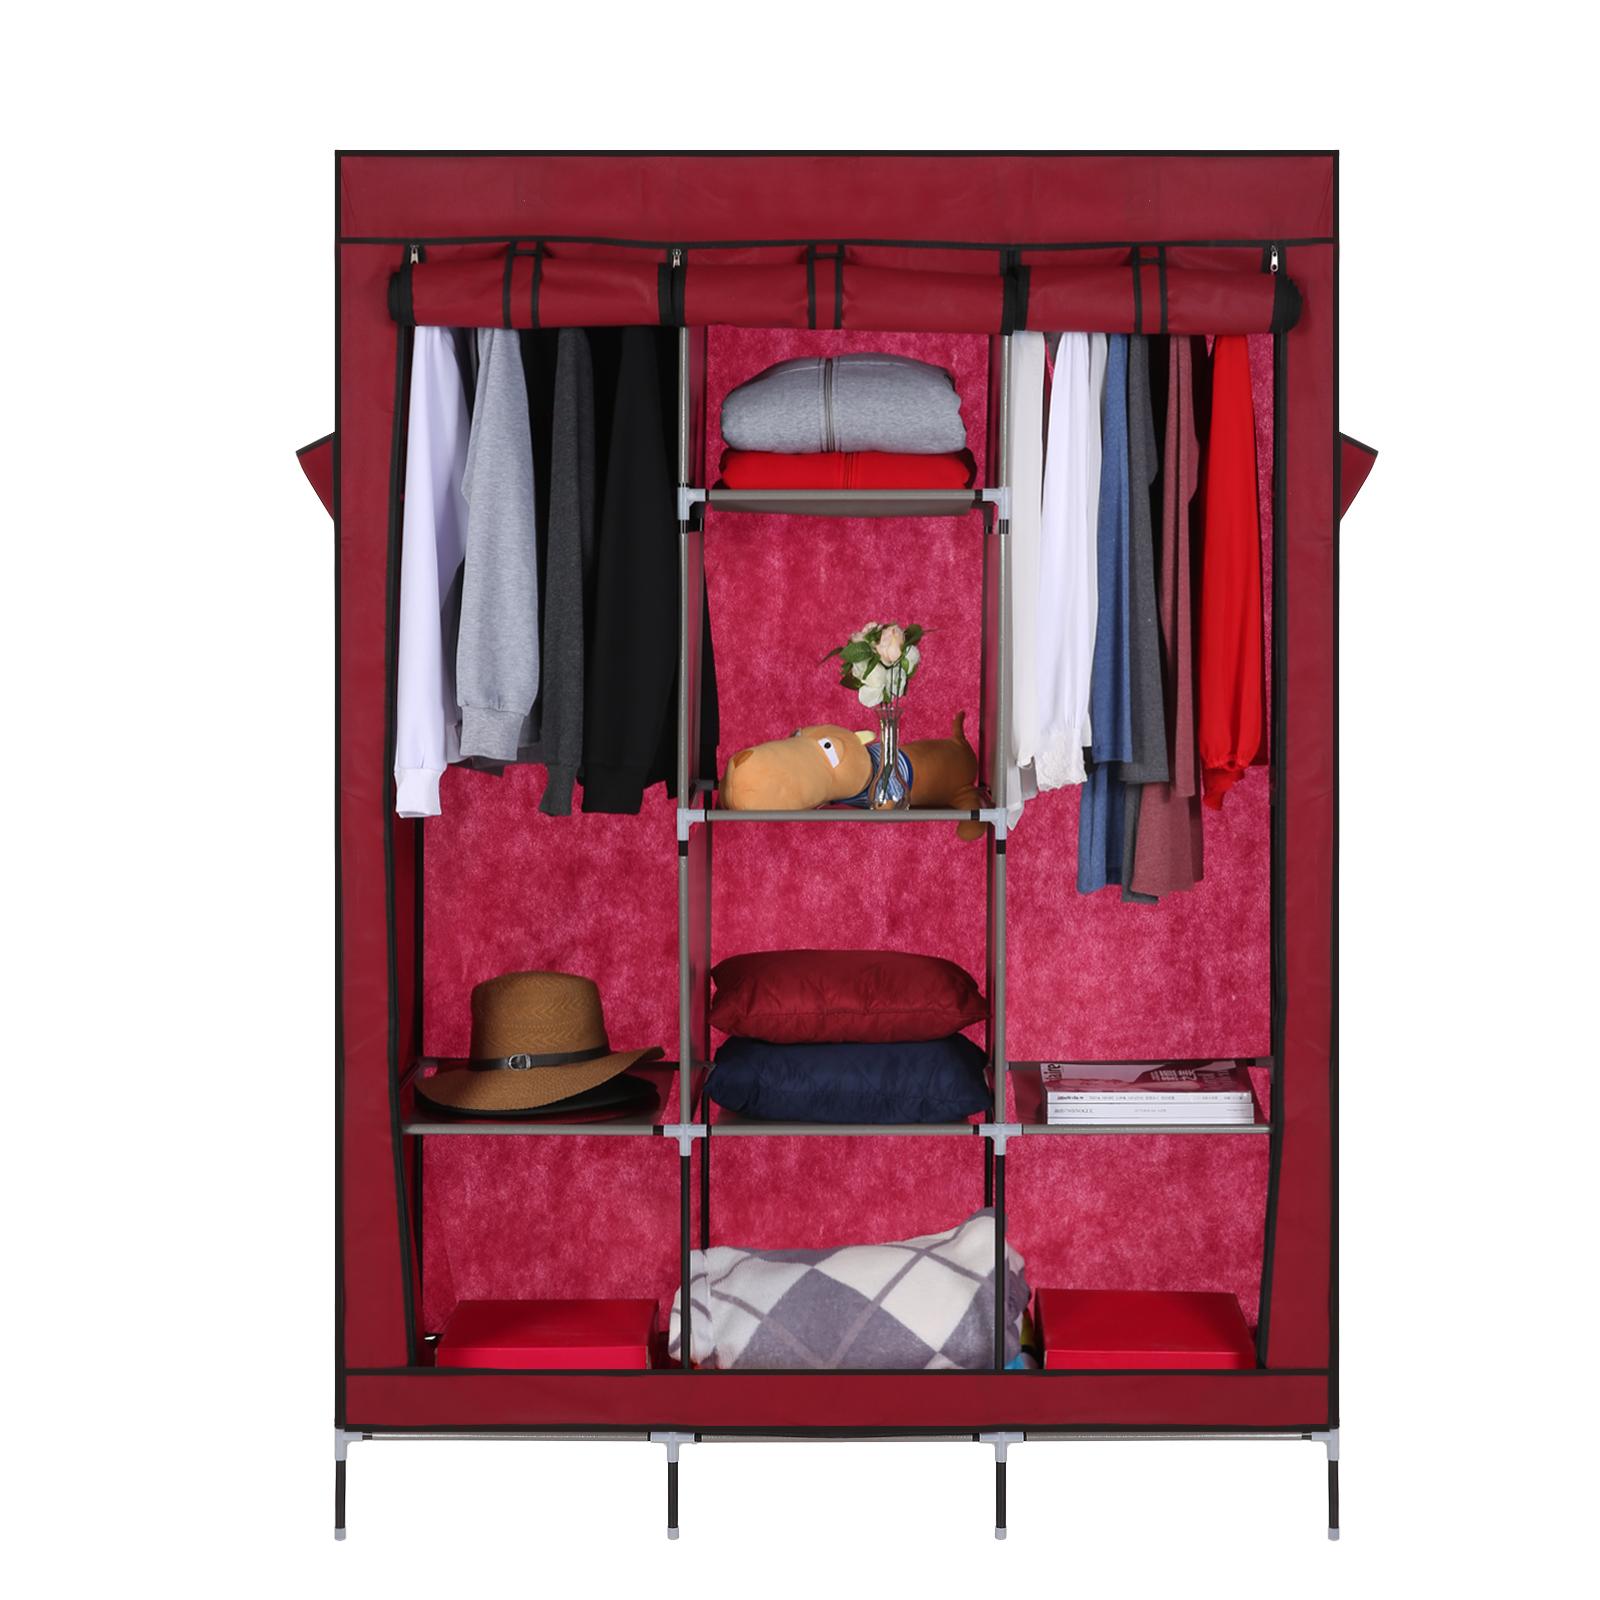 Homdox Large size 127 x 45 x 175cm Clothes Closet Organizer Storage Rack Portable Wardrobe Hanger Armoires Wine Red 22